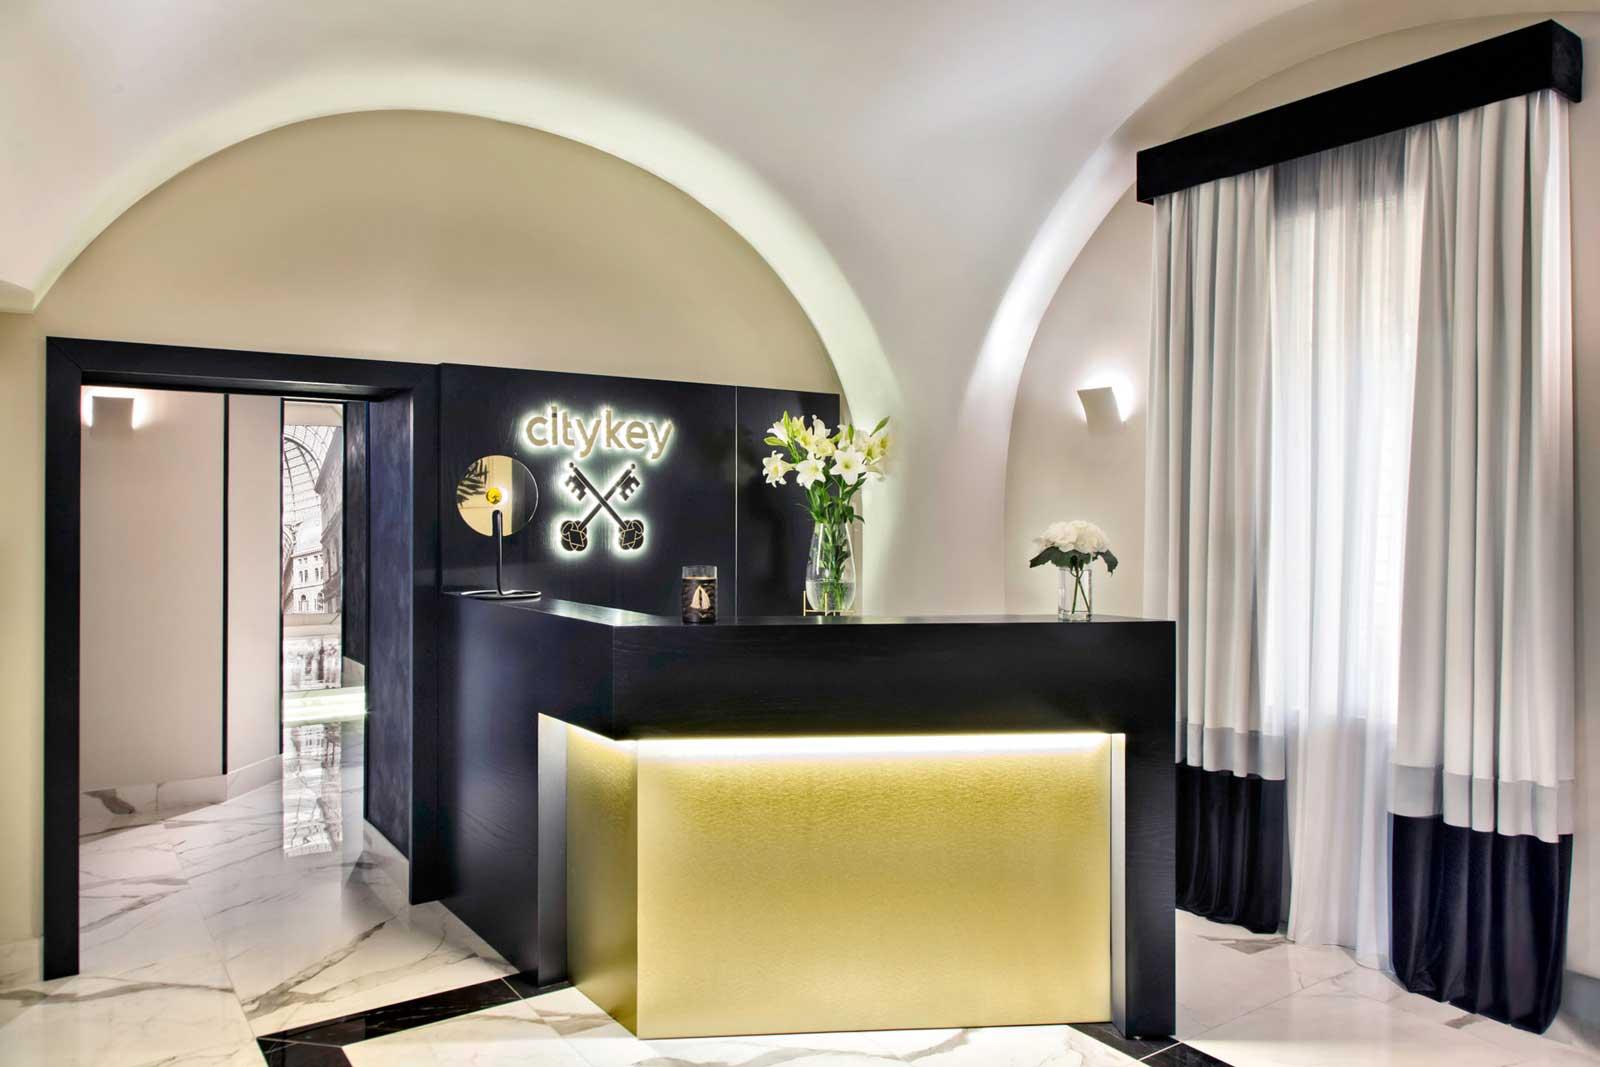 Bed and Breakfast Citykey Napoli - B&B design Napoli